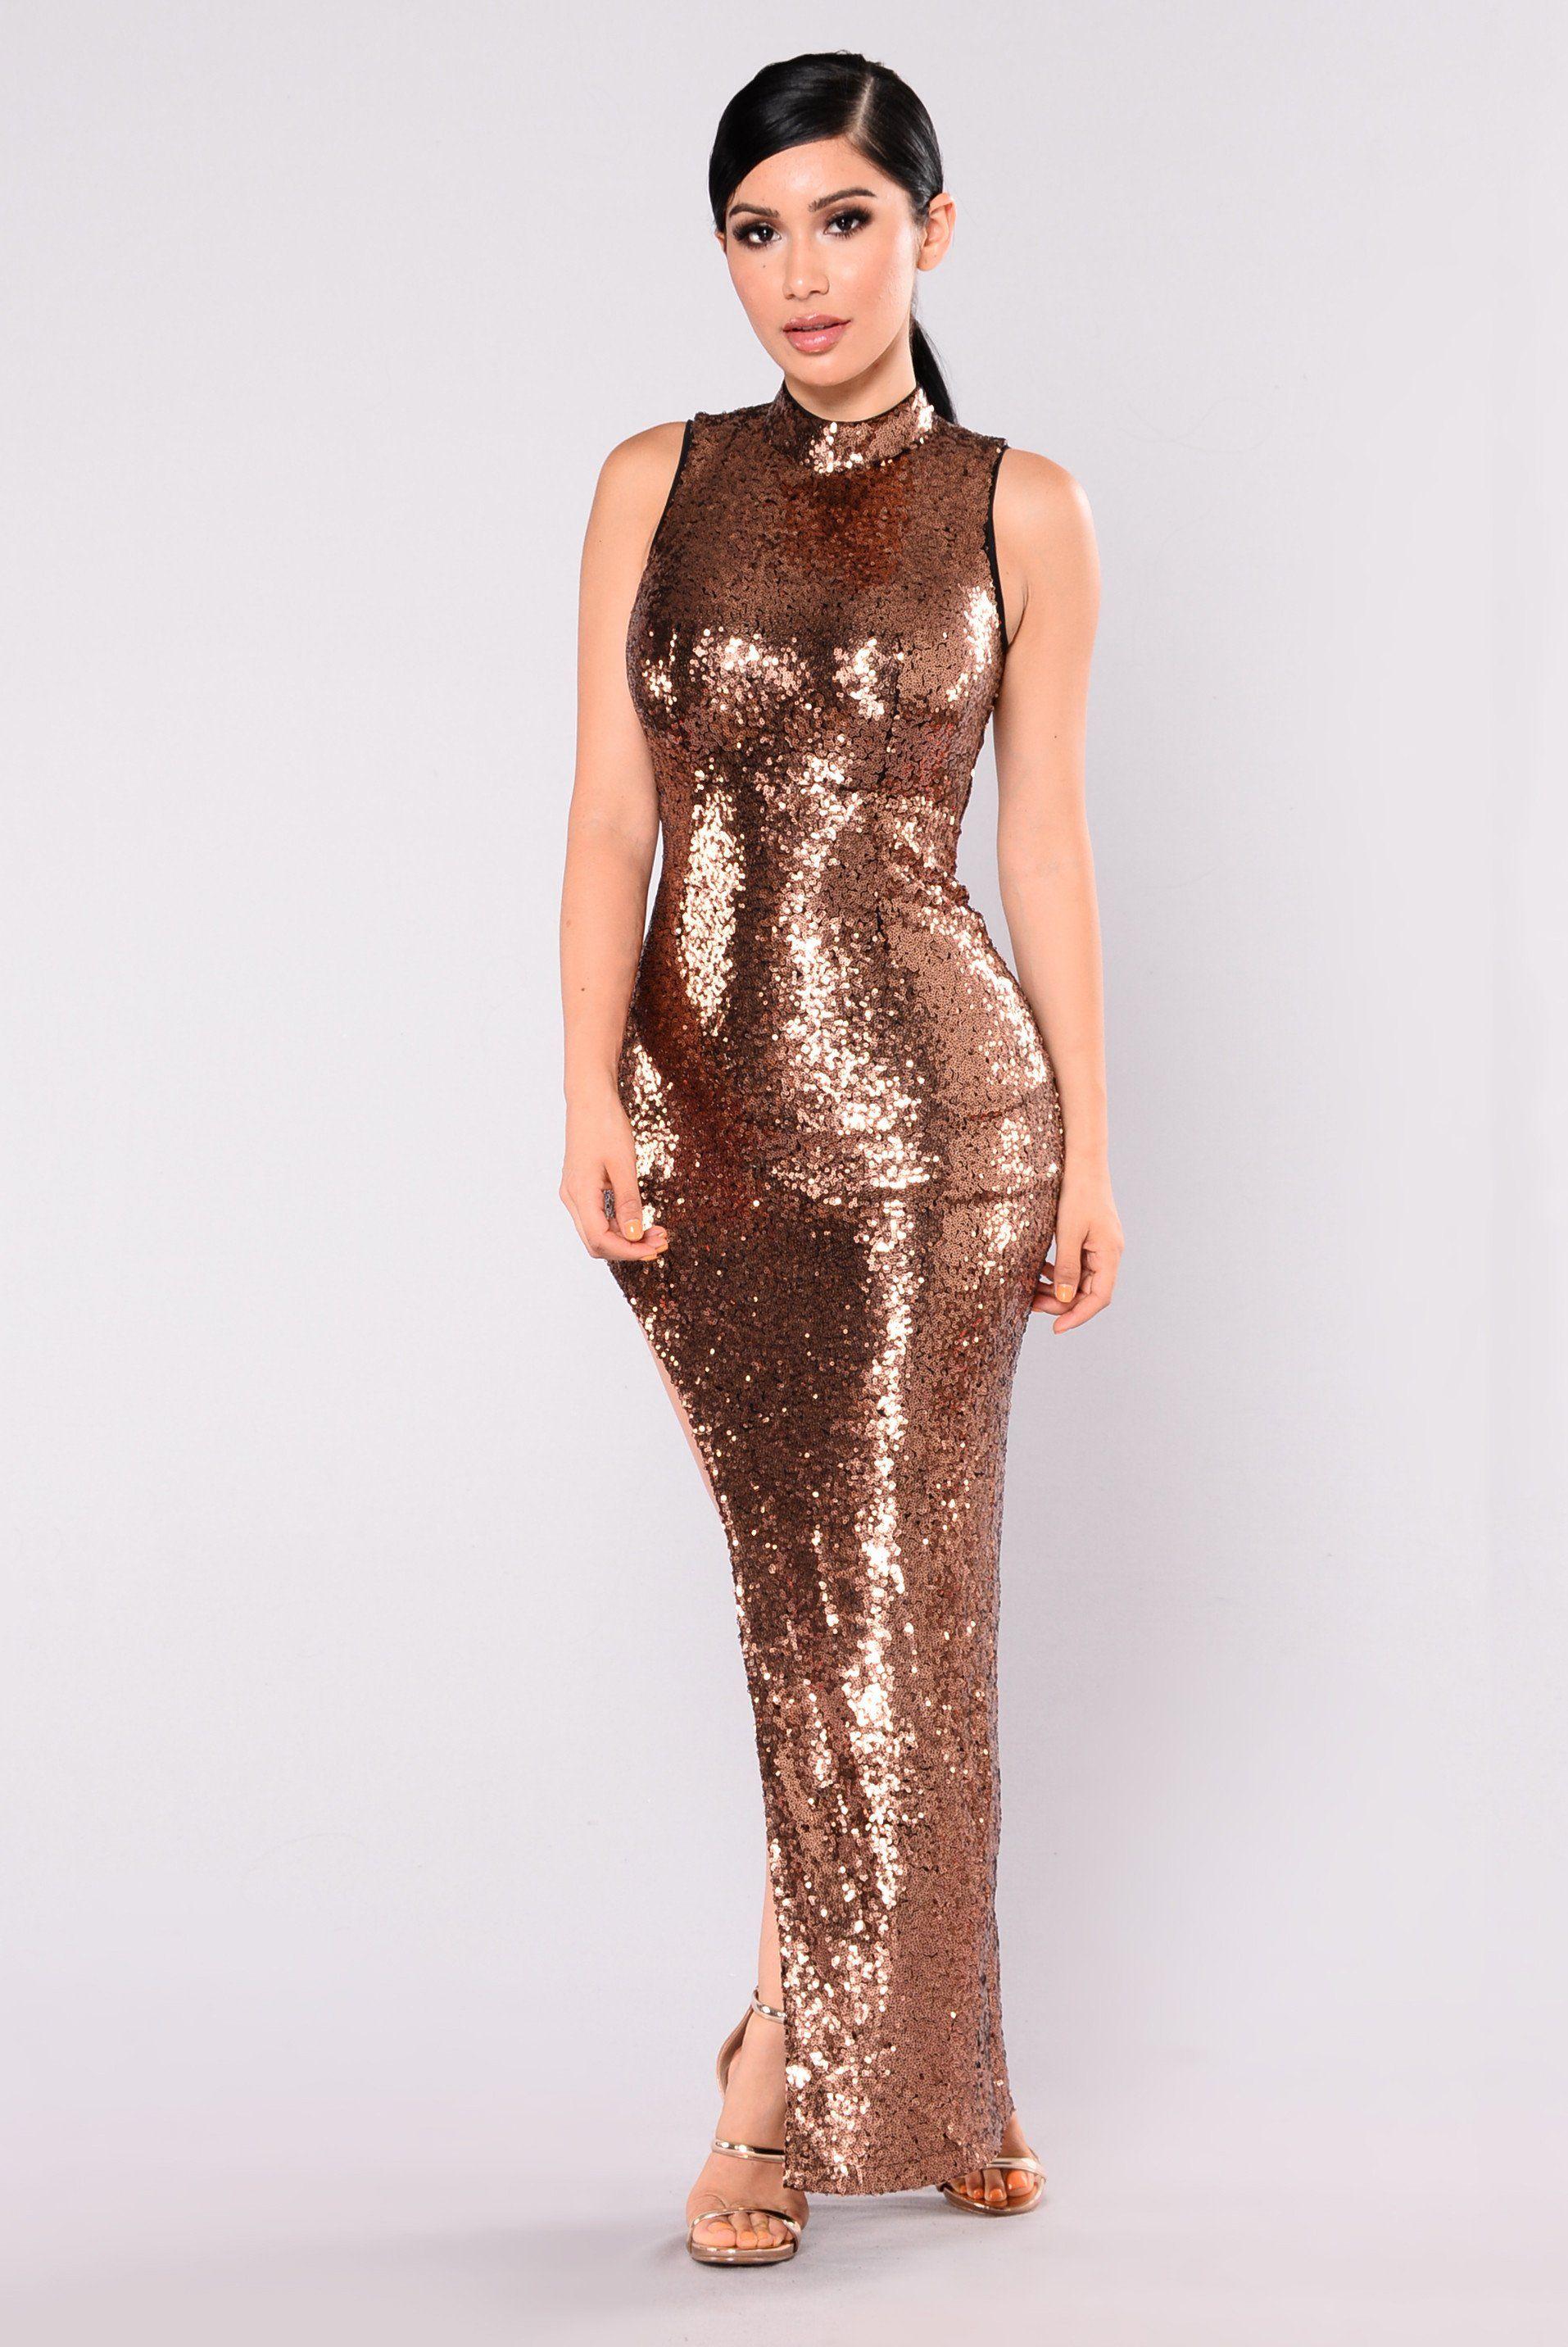 618731406ca Runway Walk Sequin Dress - Copper